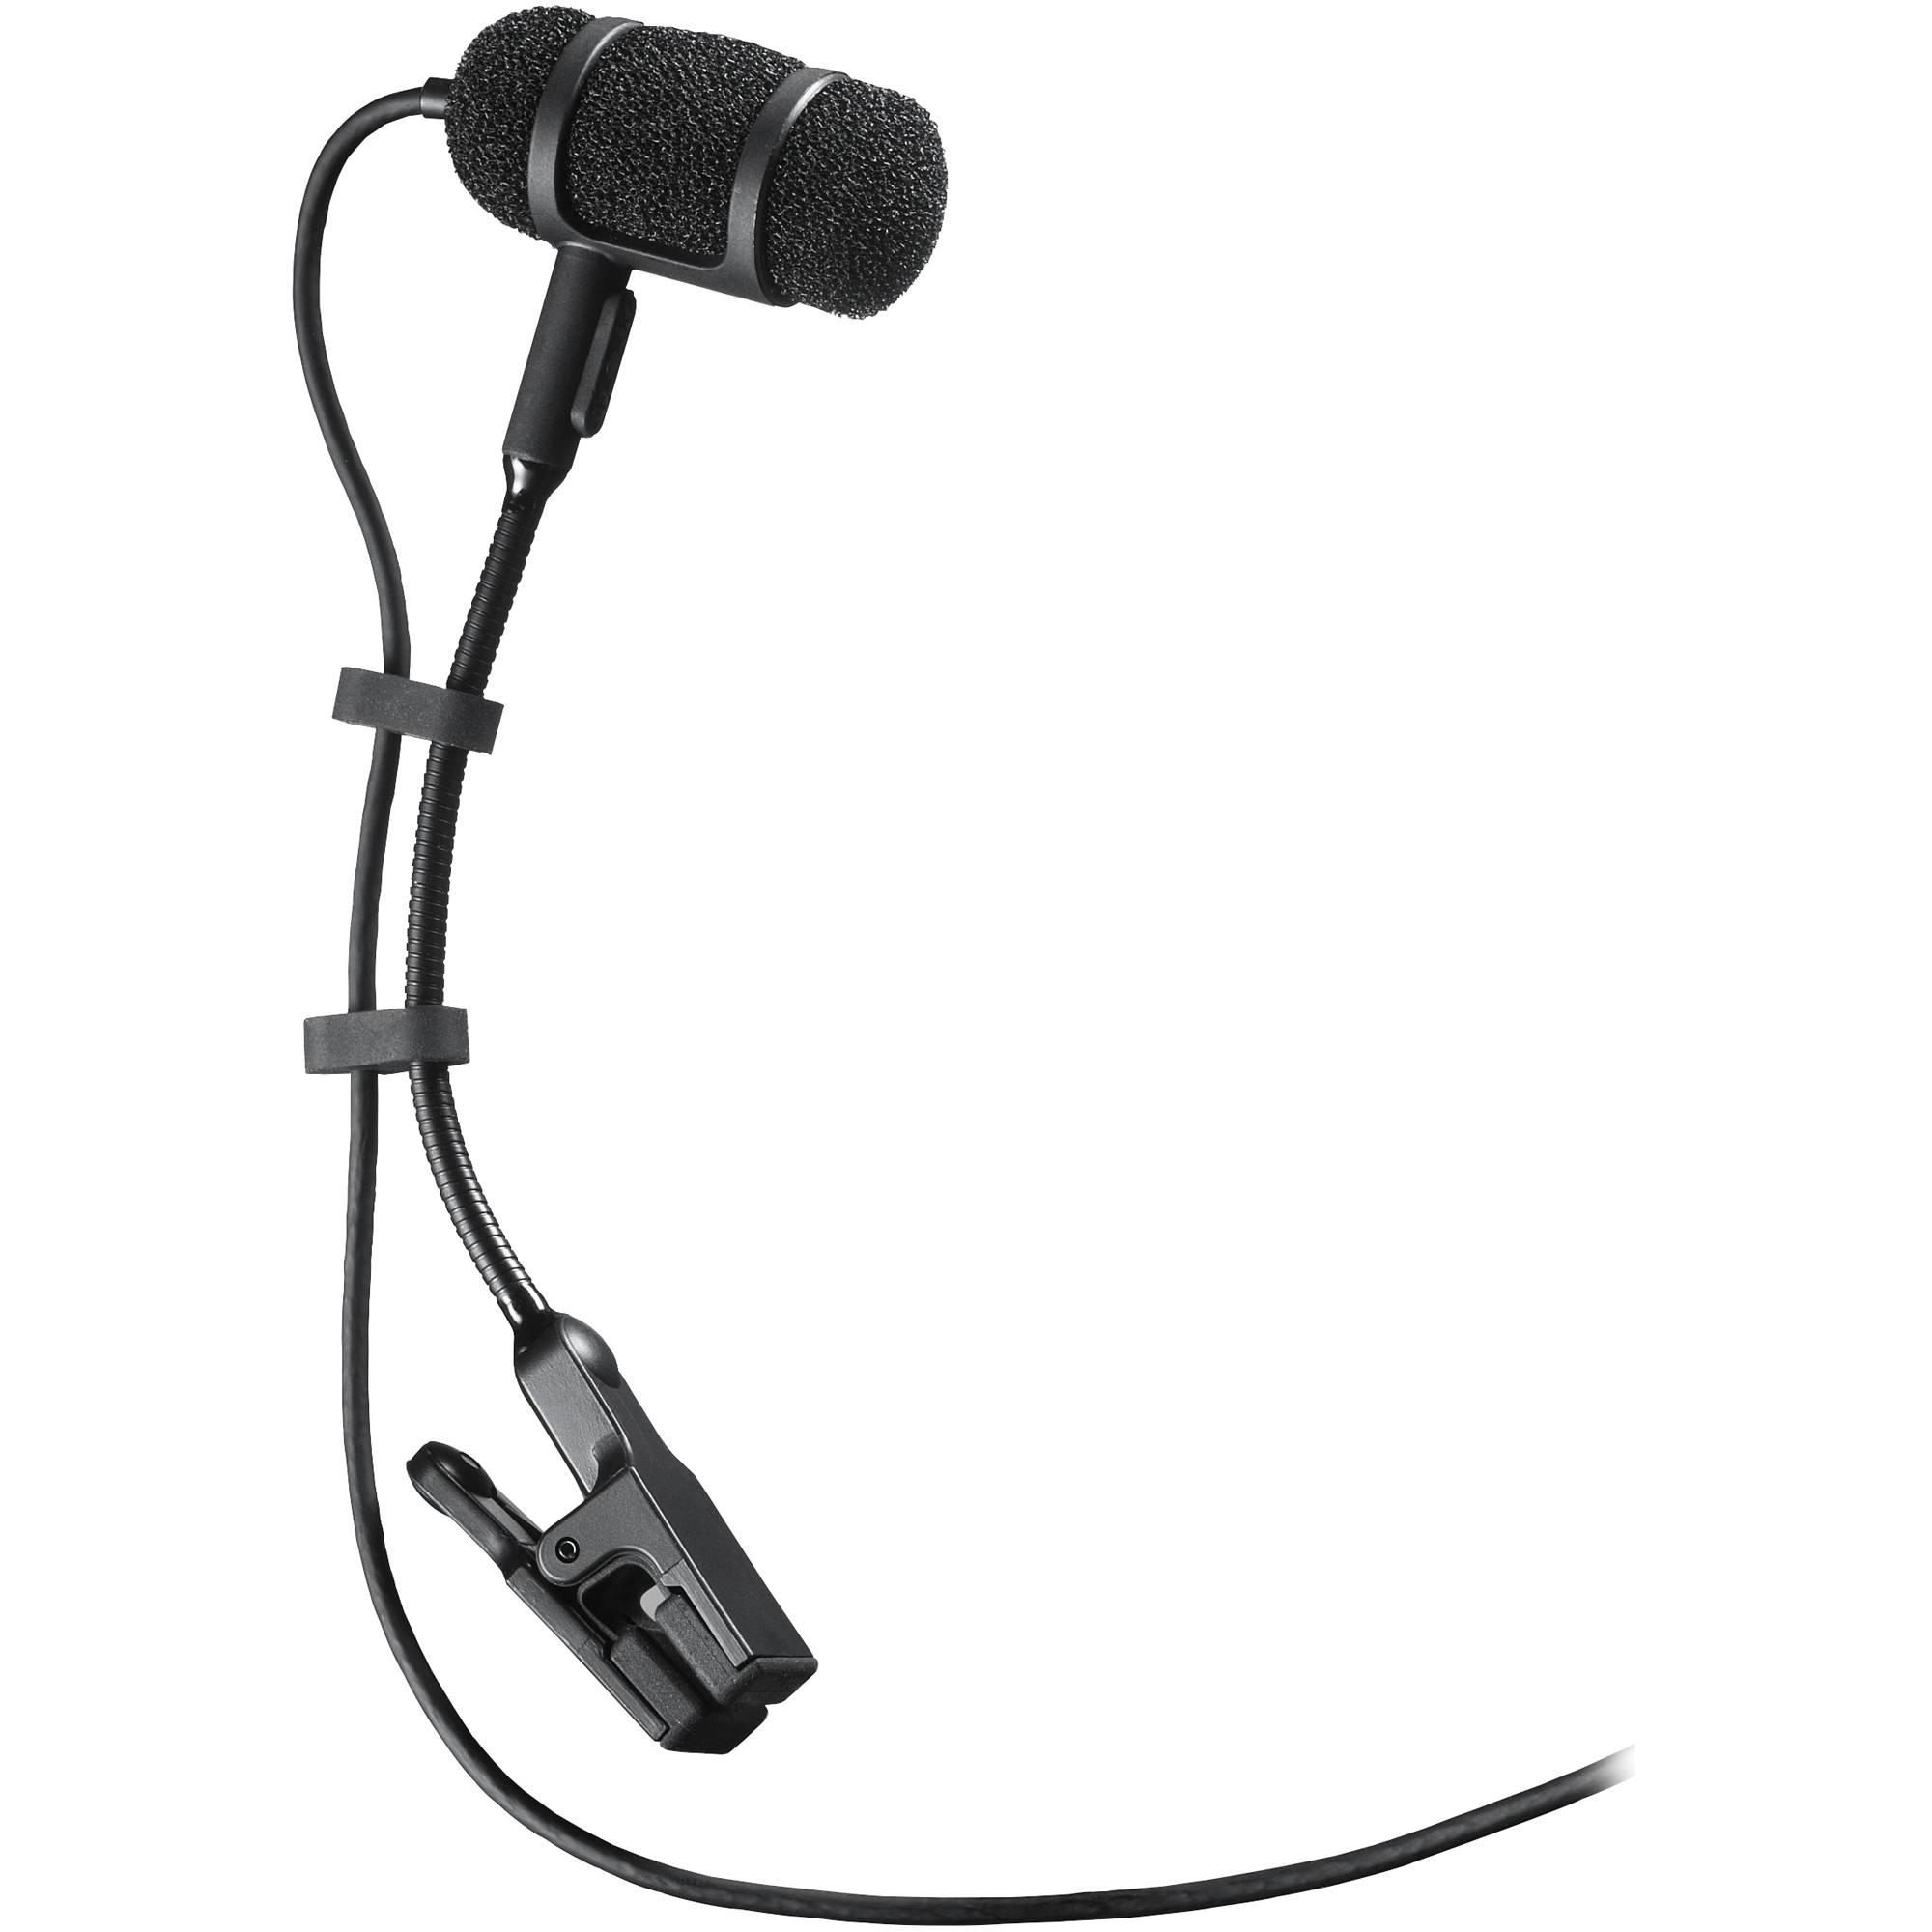 audio technica pro 35 instrument microphone pro 35 b h photo. Black Bedroom Furniture Sets. Home Design Ideas